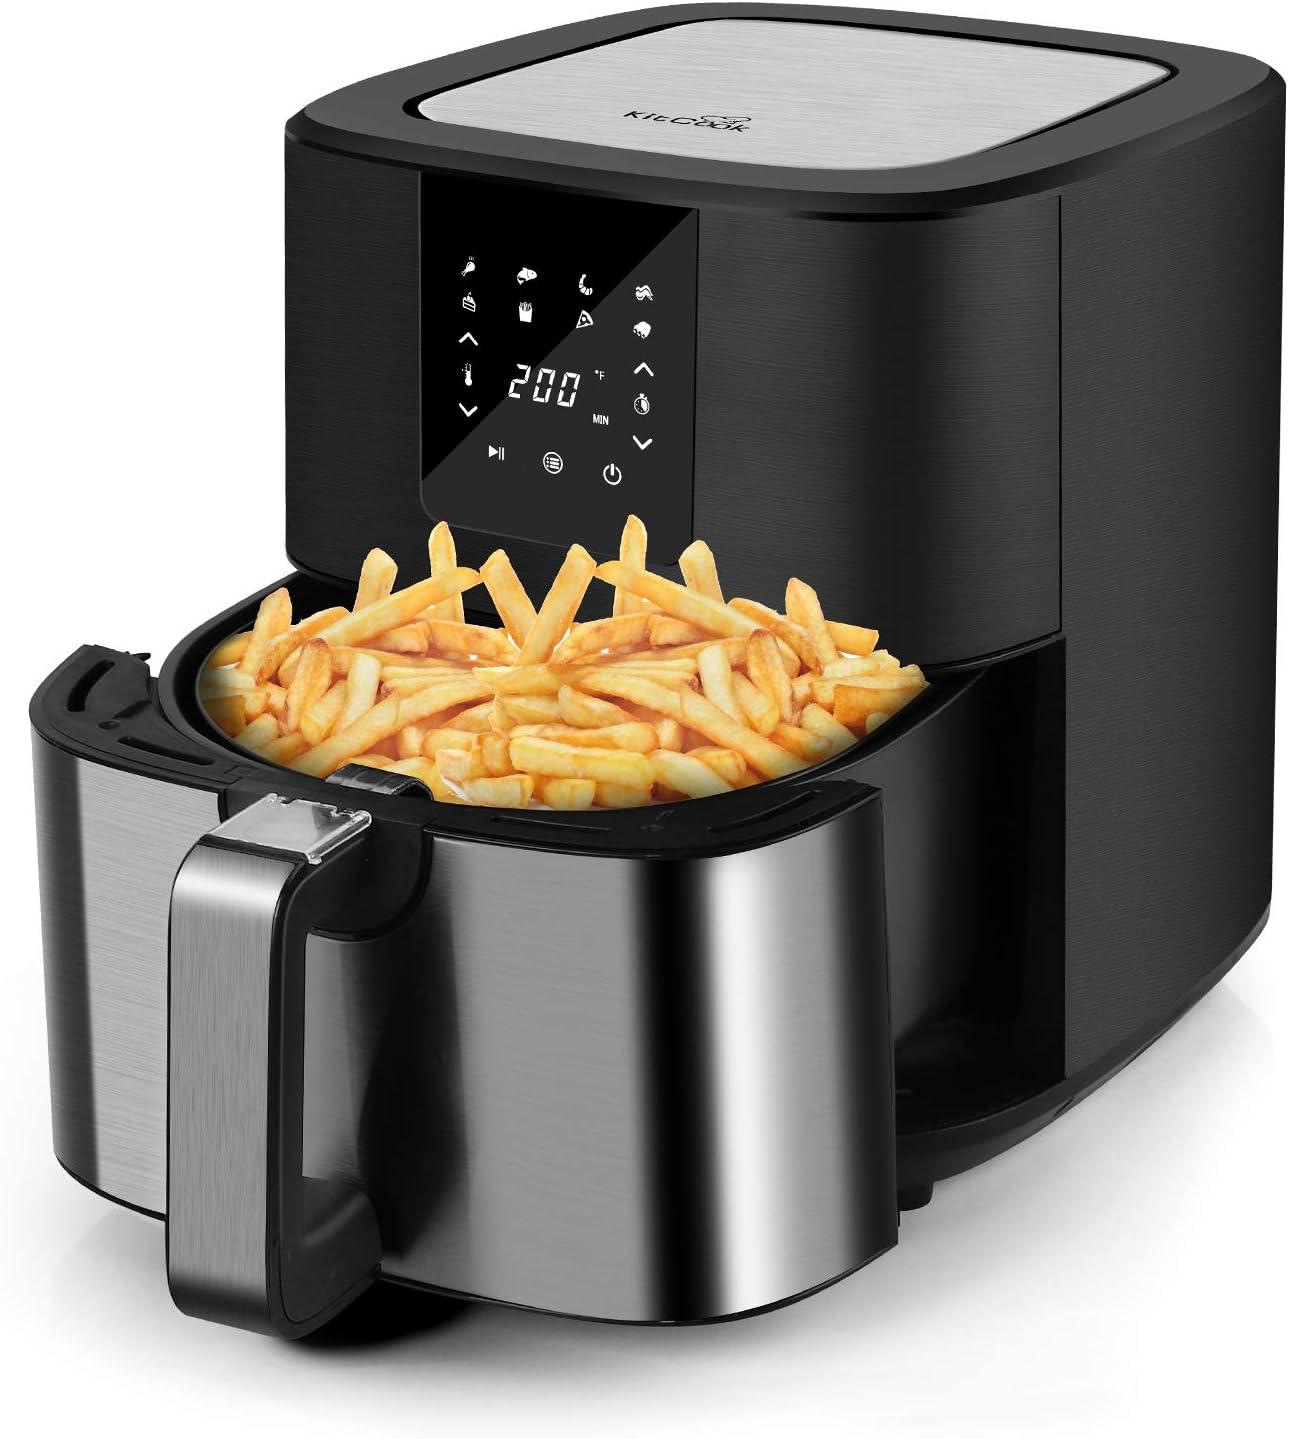 KitCook Air Fryer, 6.8 QT Air Fryer Oven with 8 Preset Menu,Nonstick Basket